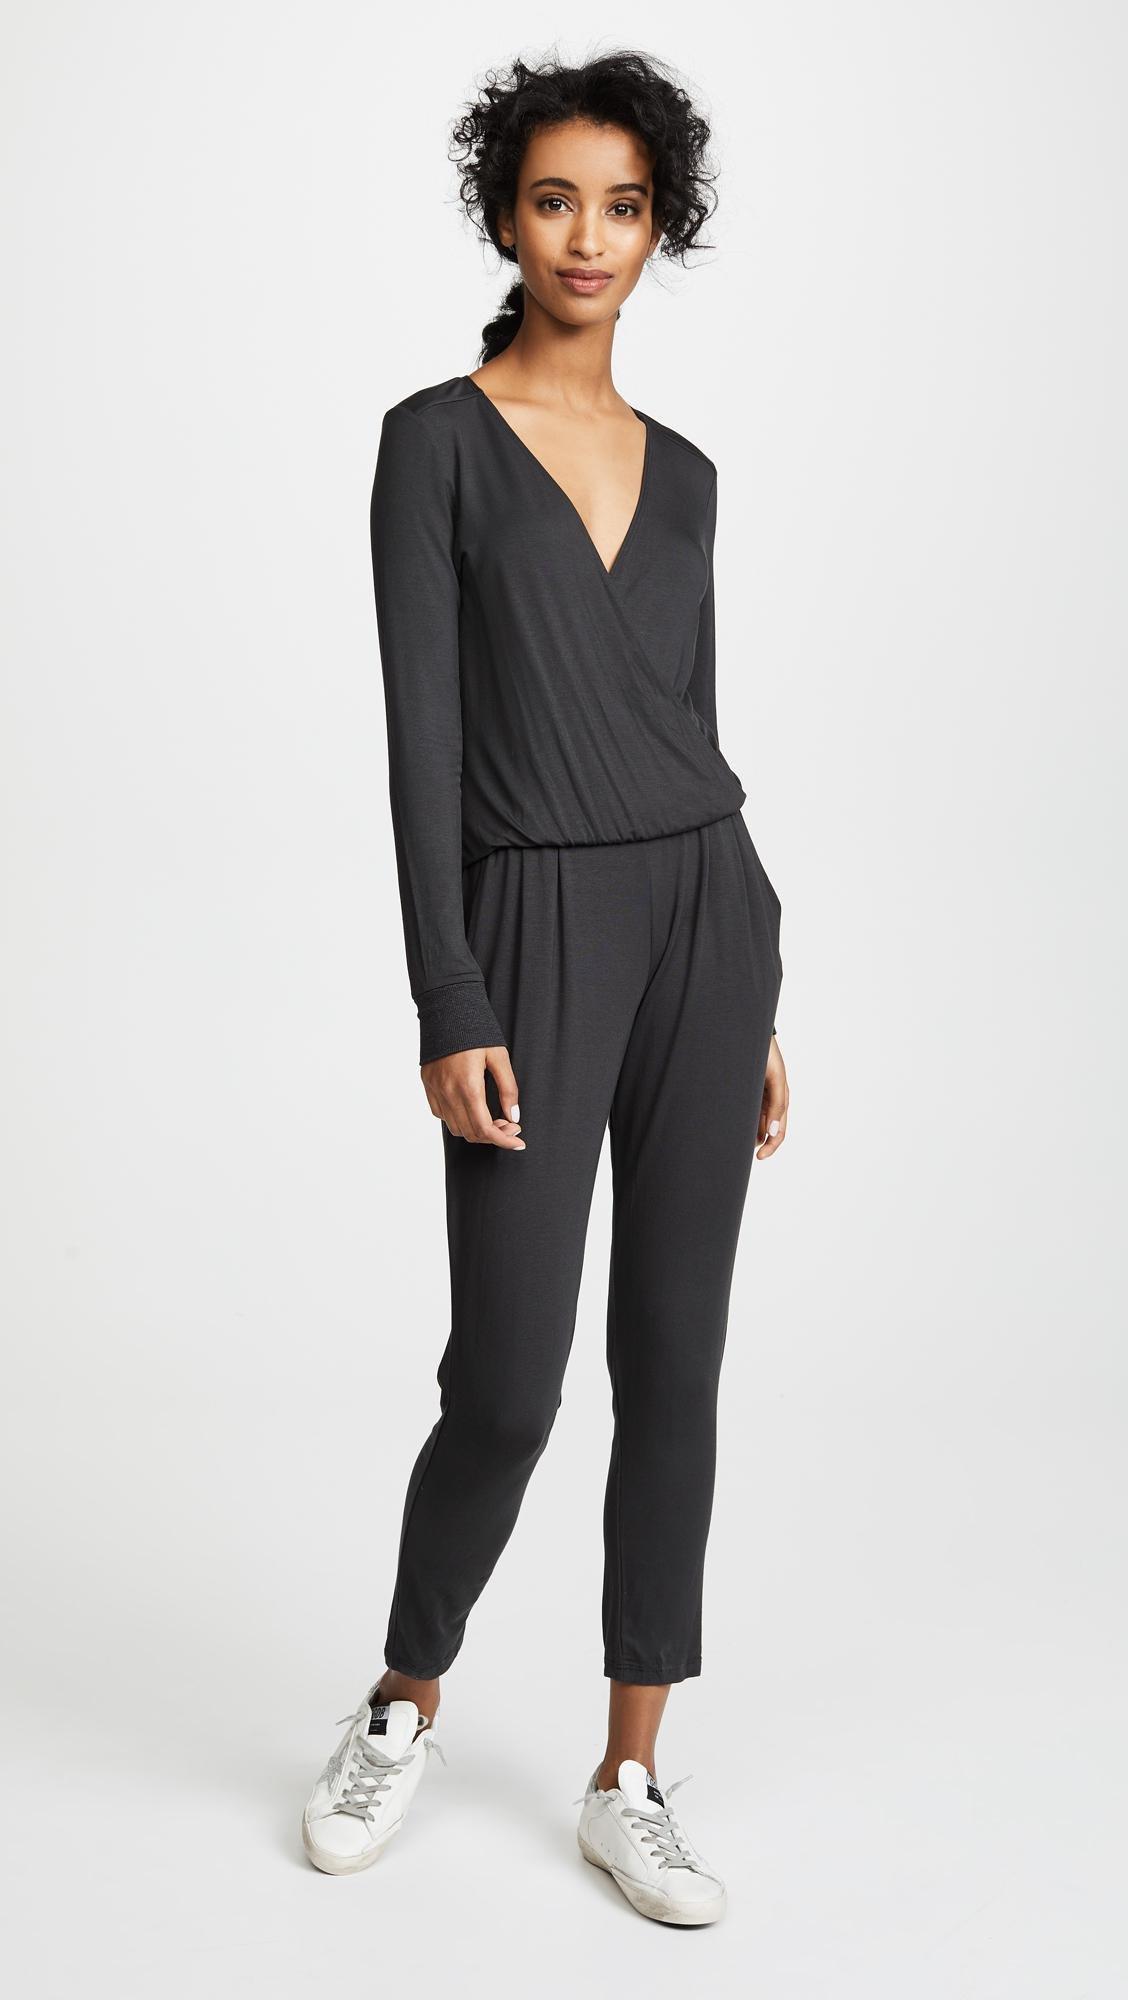 308b71cea2eb Lyst - Spiritual Gangster Surplice Jumpsuit in Black